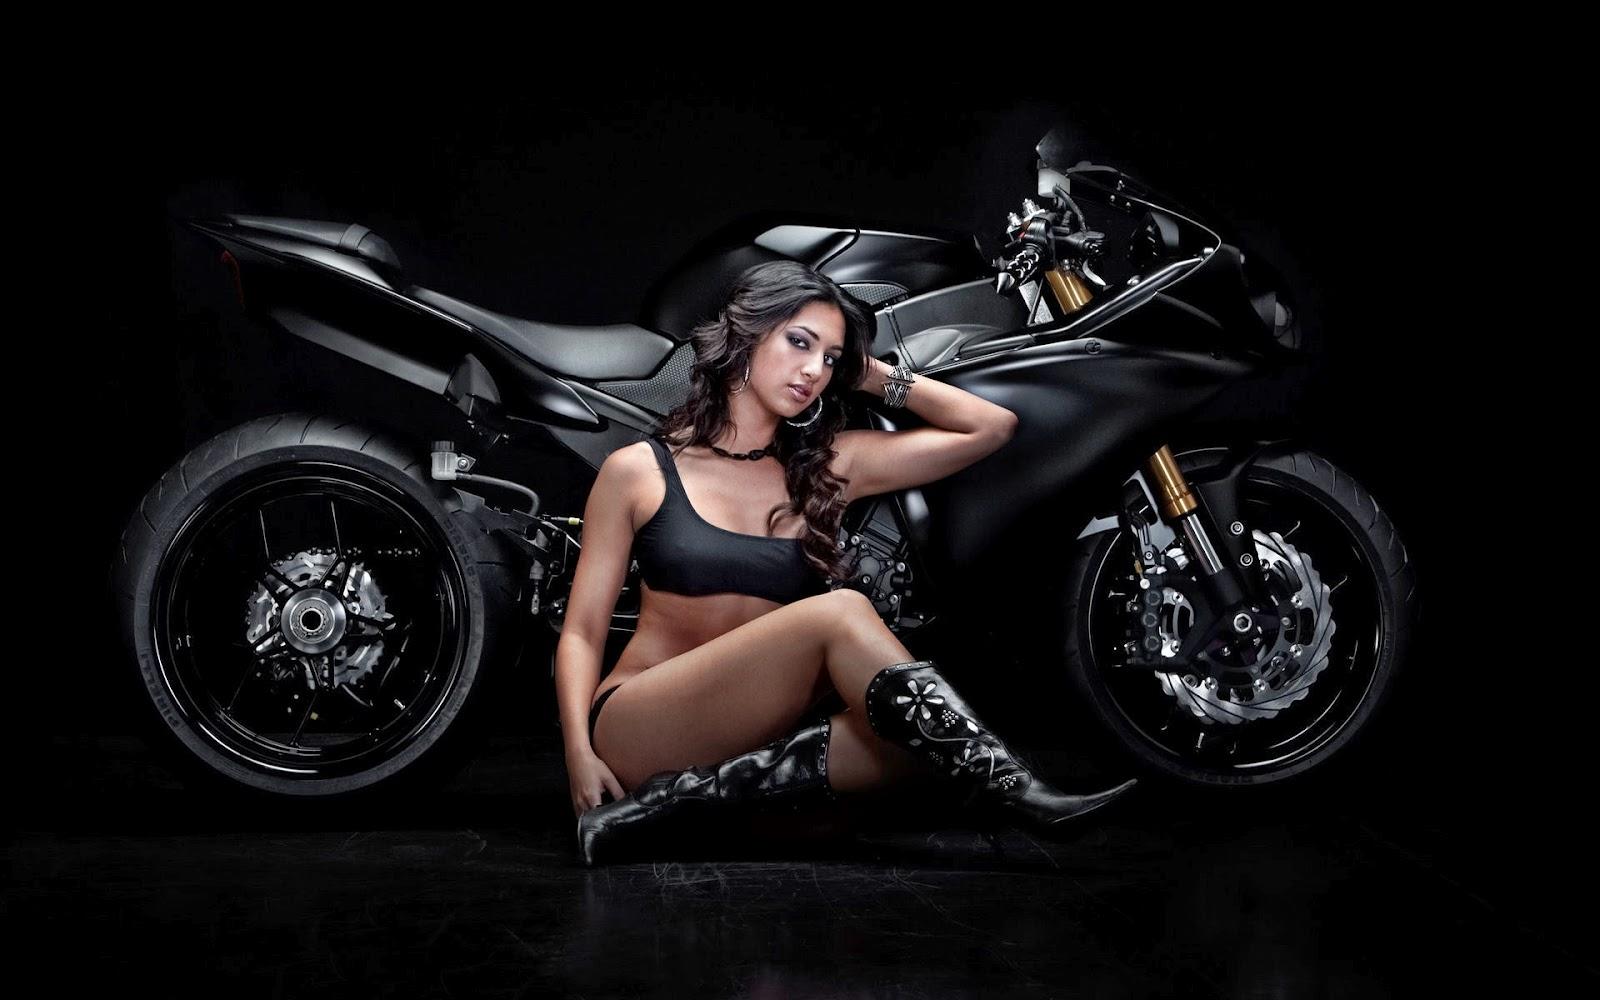 http://2.bp.blogspot.com/-OFjGToAe5zA/T7u_xyQ9UiI/AAAAAAAAI5s/LVTsX2VinF4/s1600/1920+X+1200+Moto+Cool+Wallpapers+16.jpg